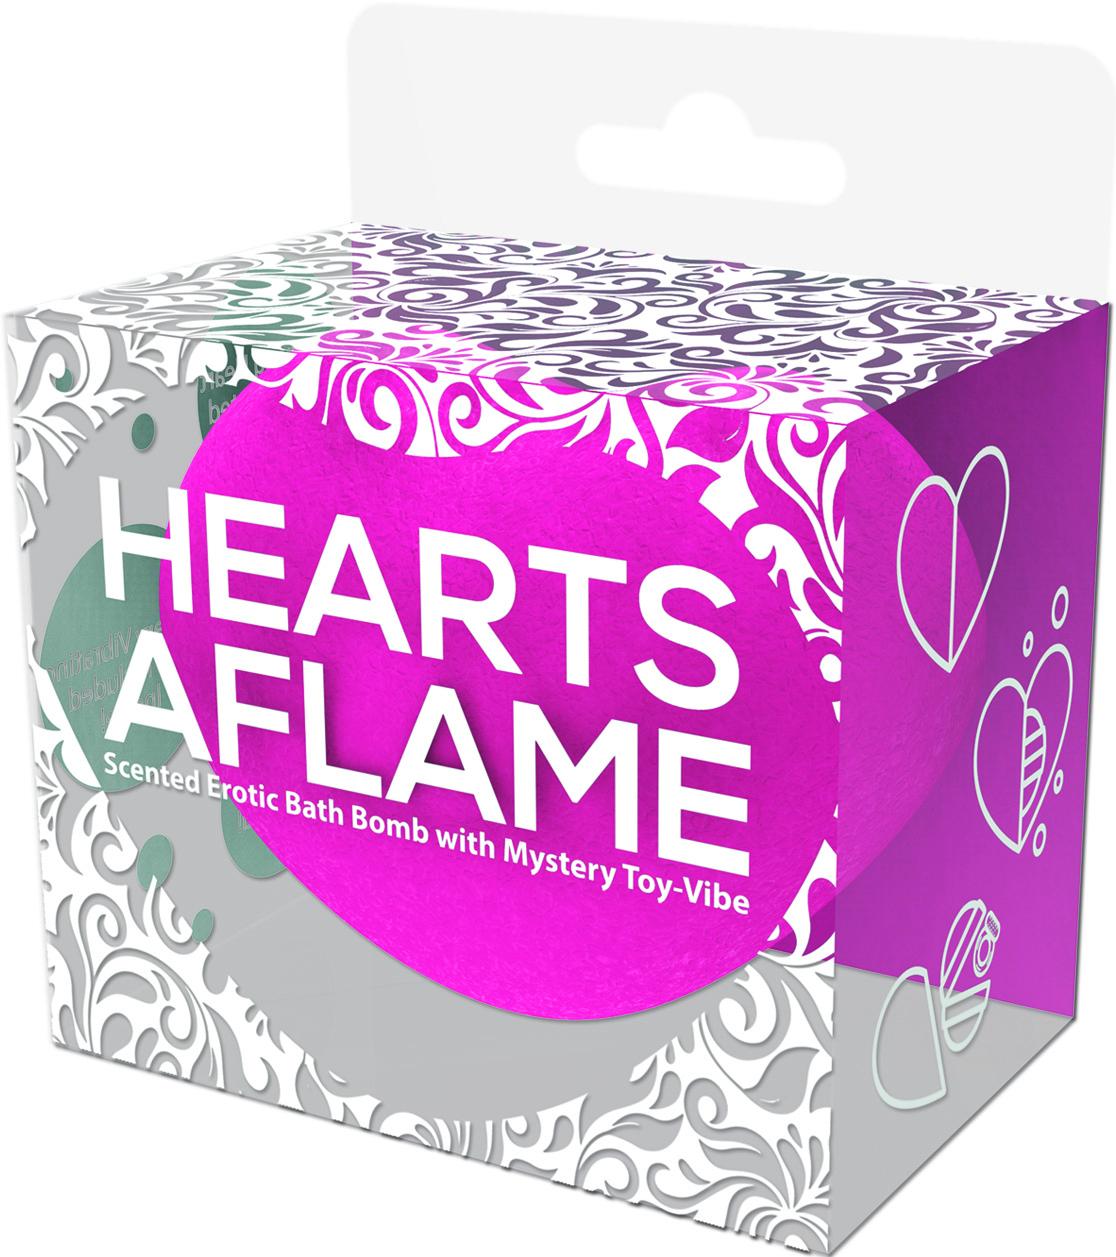 HEARTS AFLAME EROTIC BATH BOMB